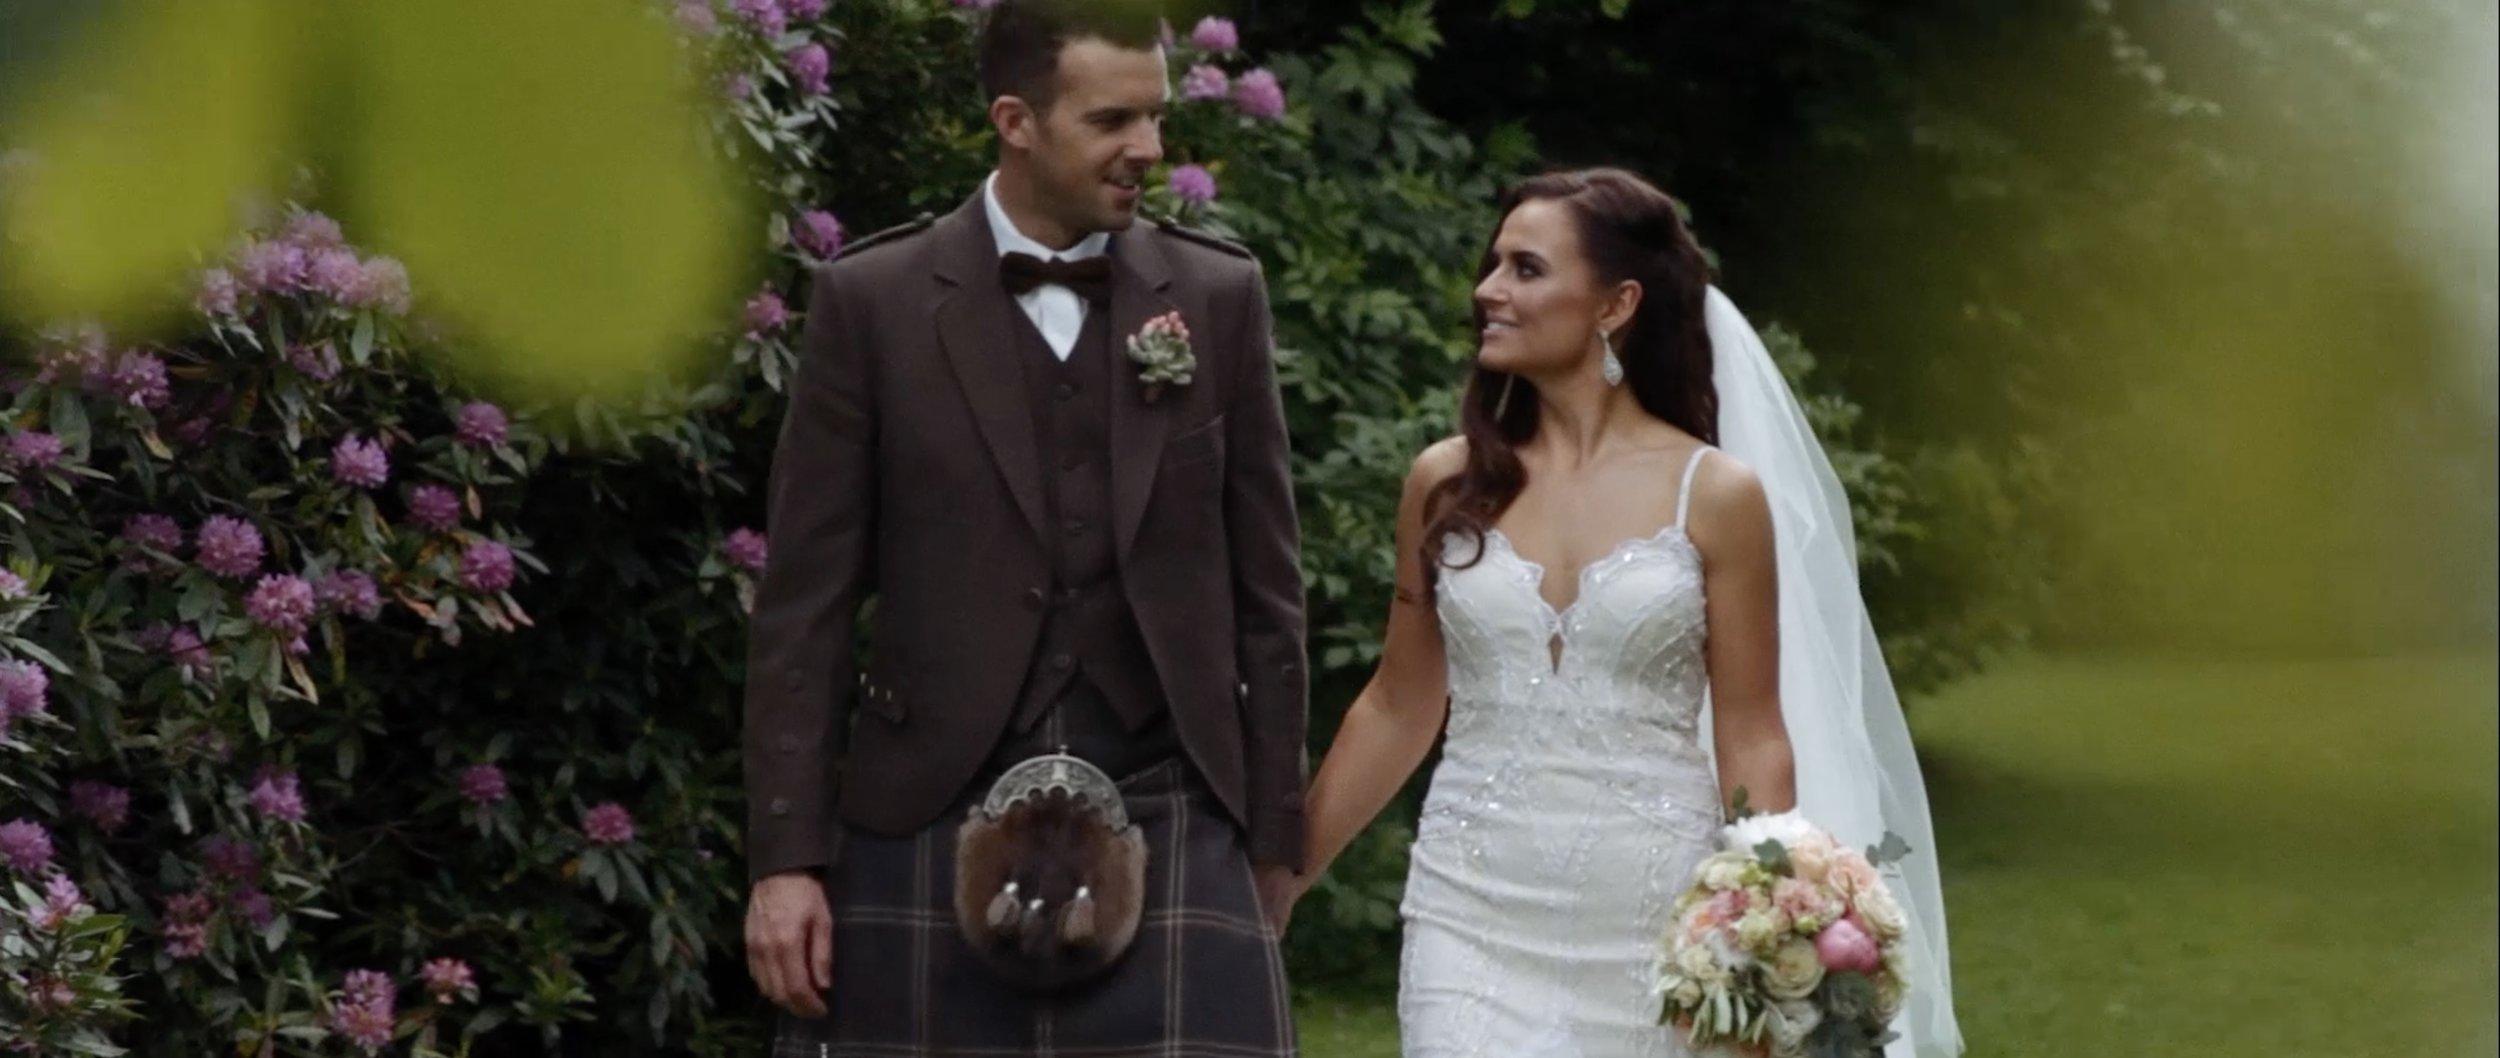 drygate-wedding-videographer_LL_06.jpg